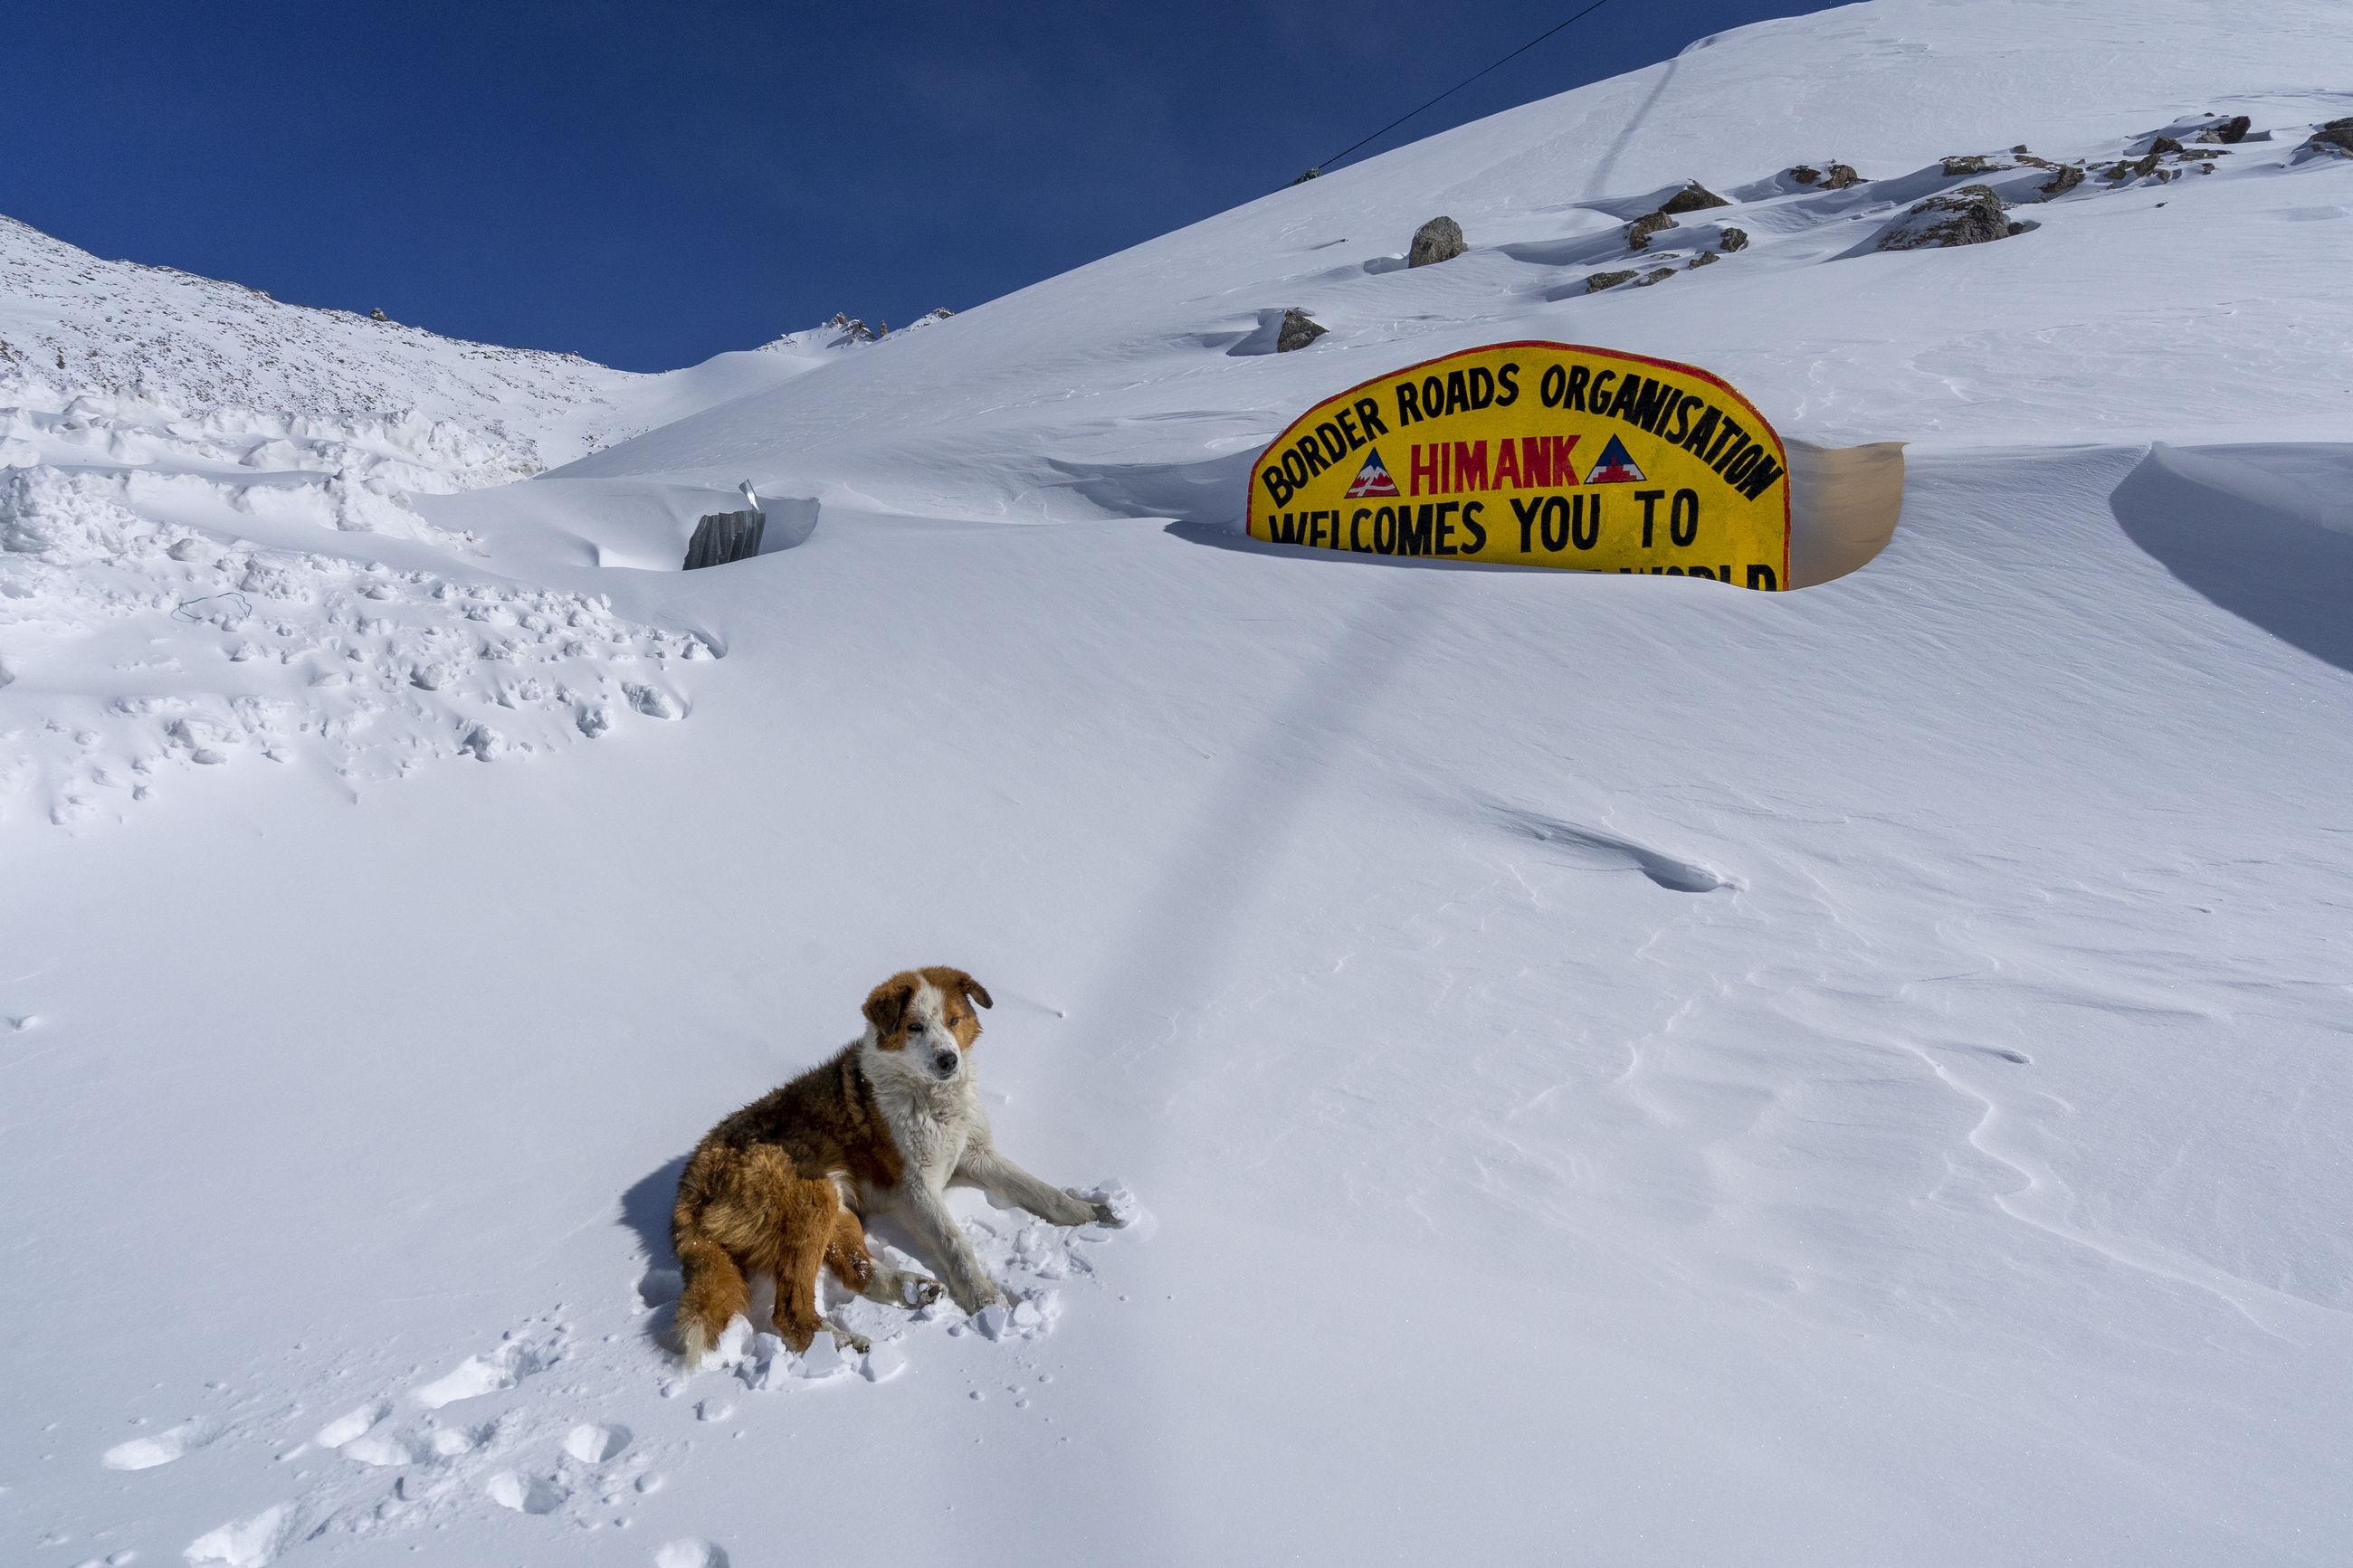 HIGH ANGLE VIEW OF A DOG ON SNOW